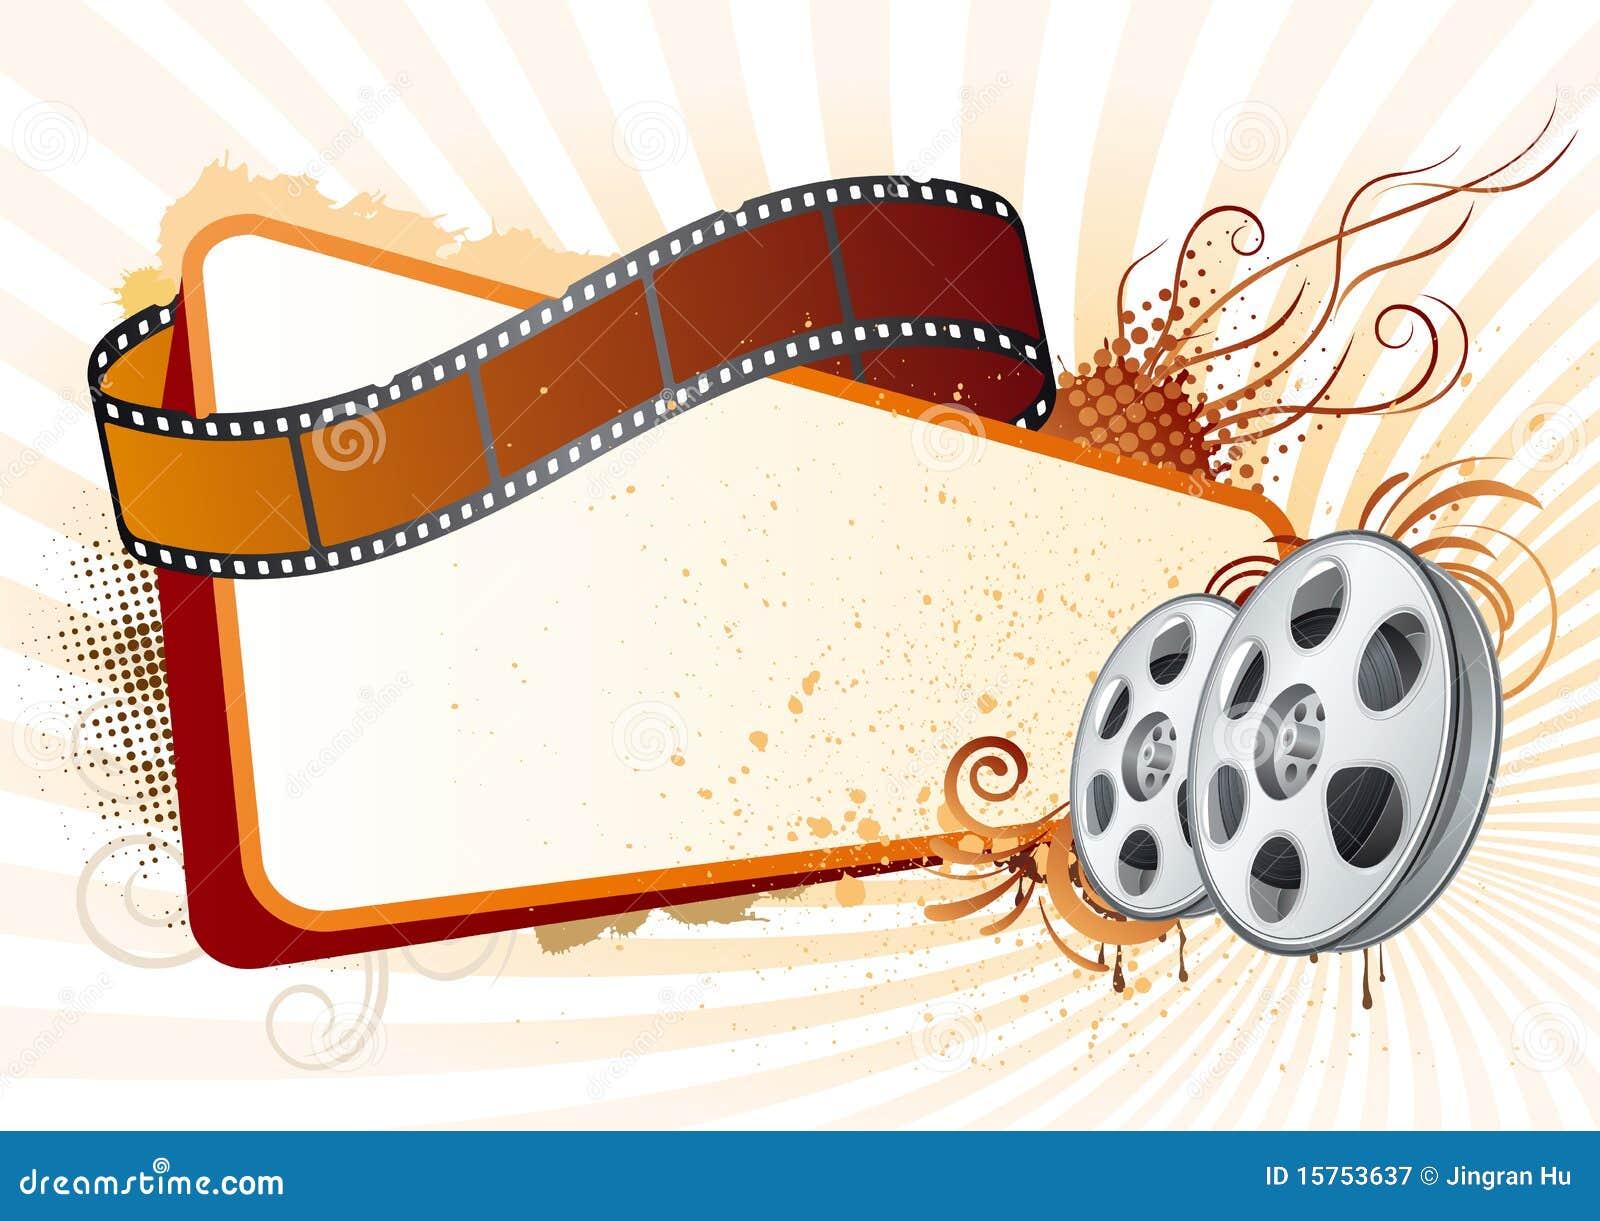 film stripmovie theme element stock vector image 15753637